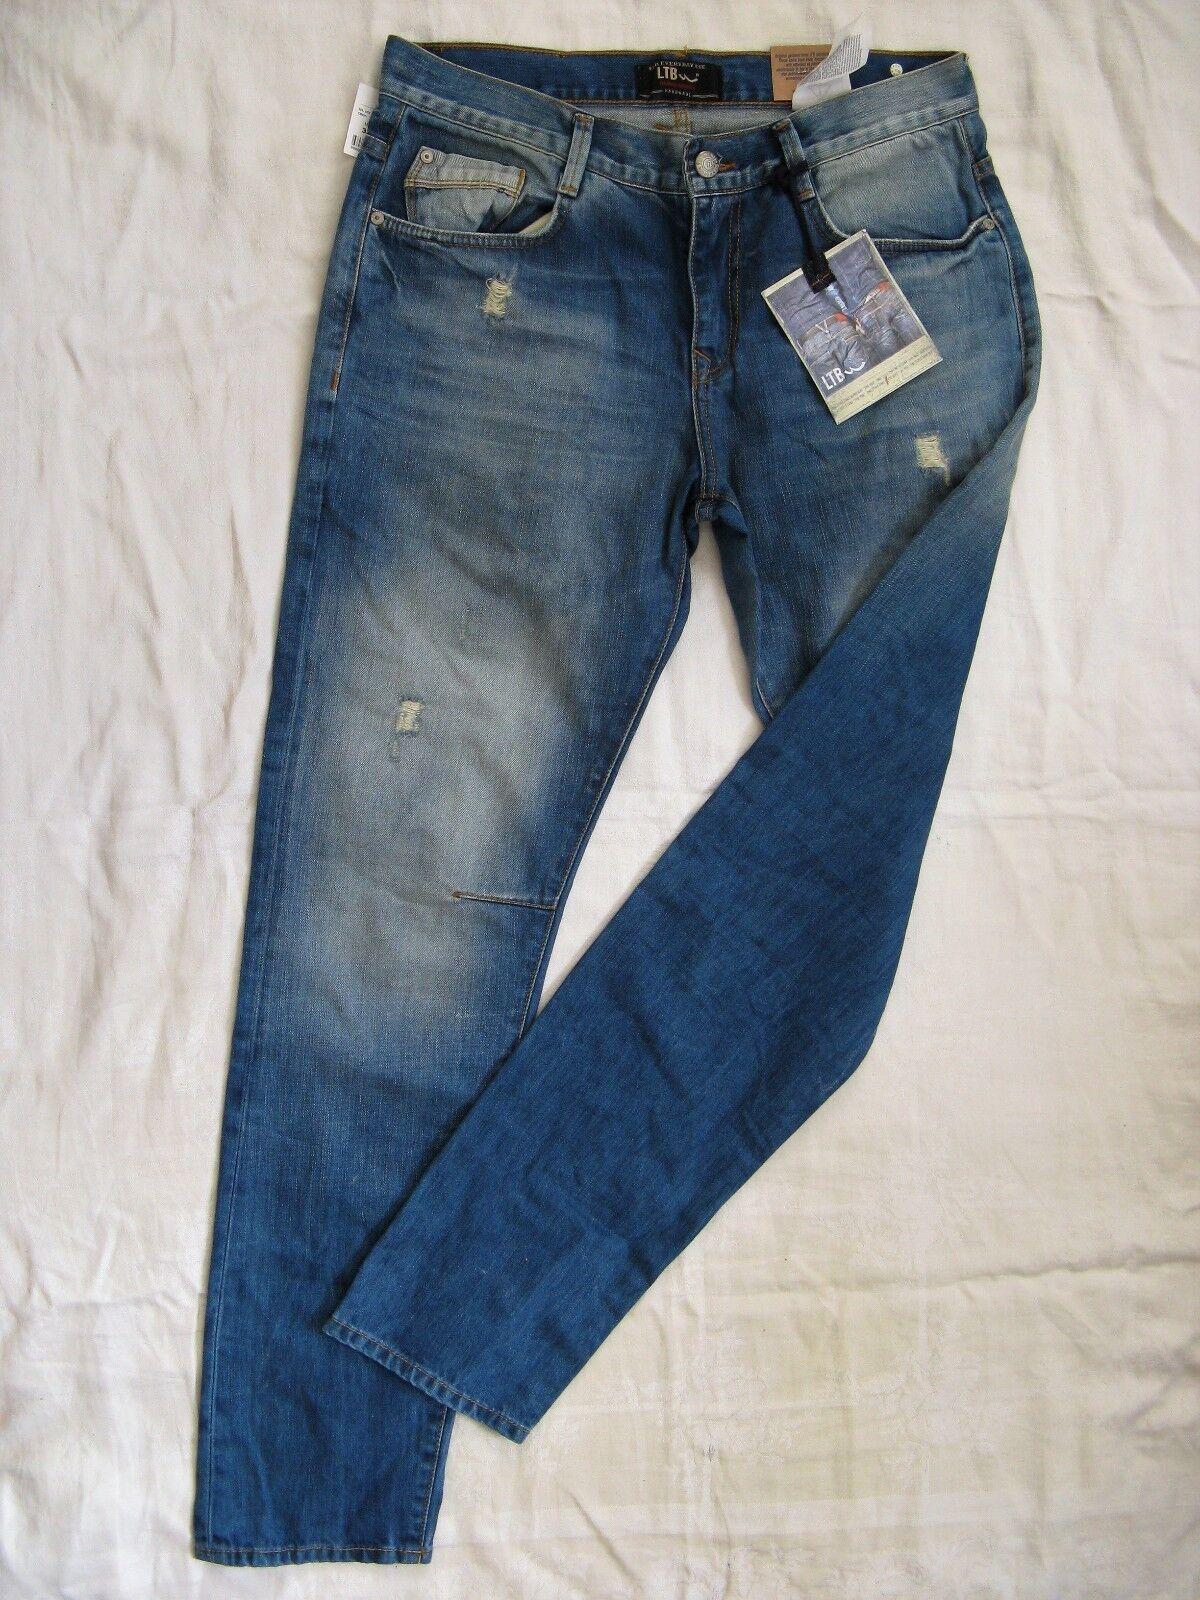 LTB Justin señores Men azul jeans  w32 l32 normal waist regular fit taperojo leg  barato